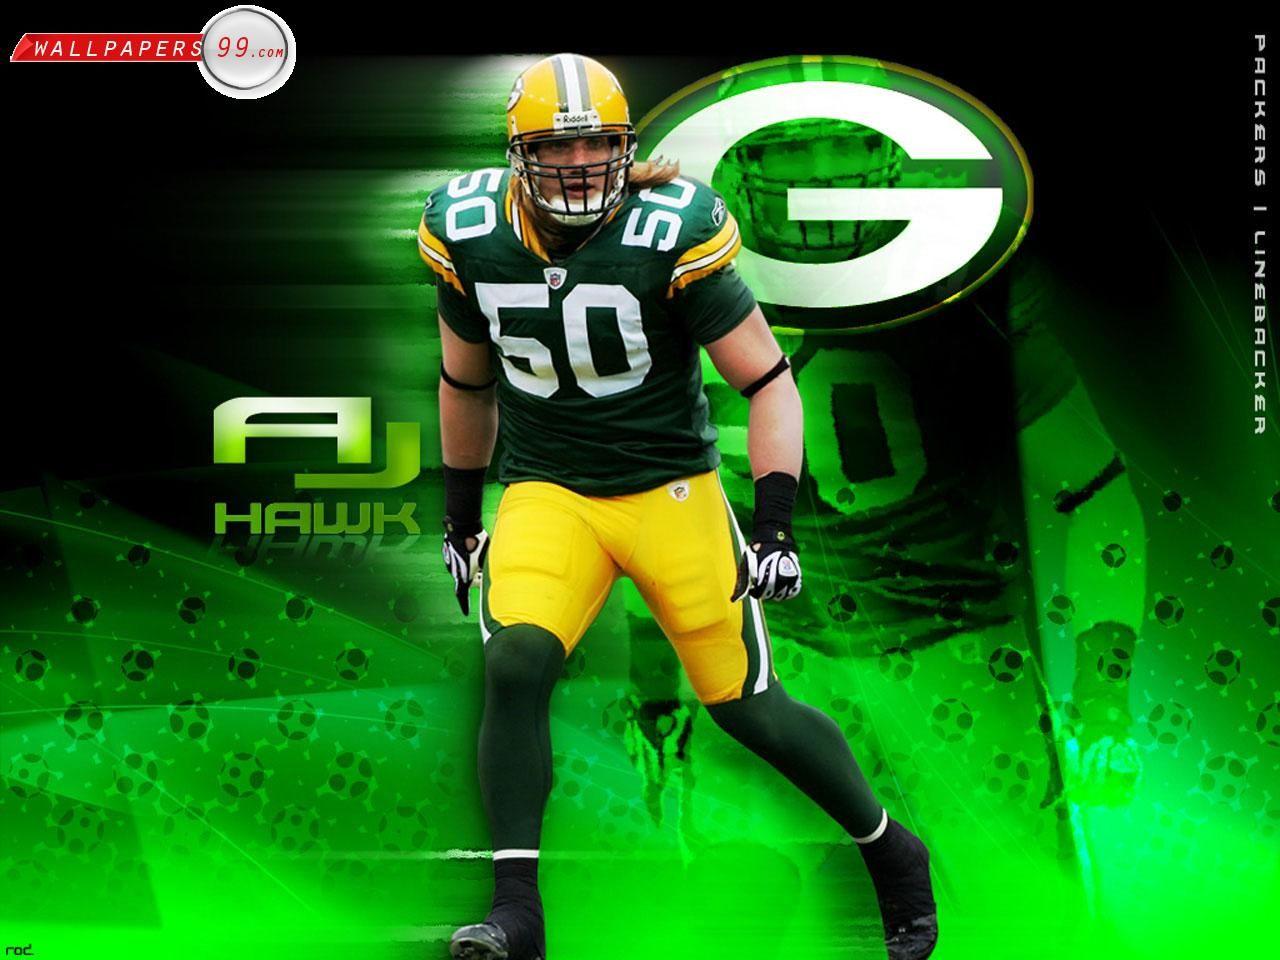 Packers Green Bay Packers Green Bay Packers Wallpaper Green Bay Packers Girl